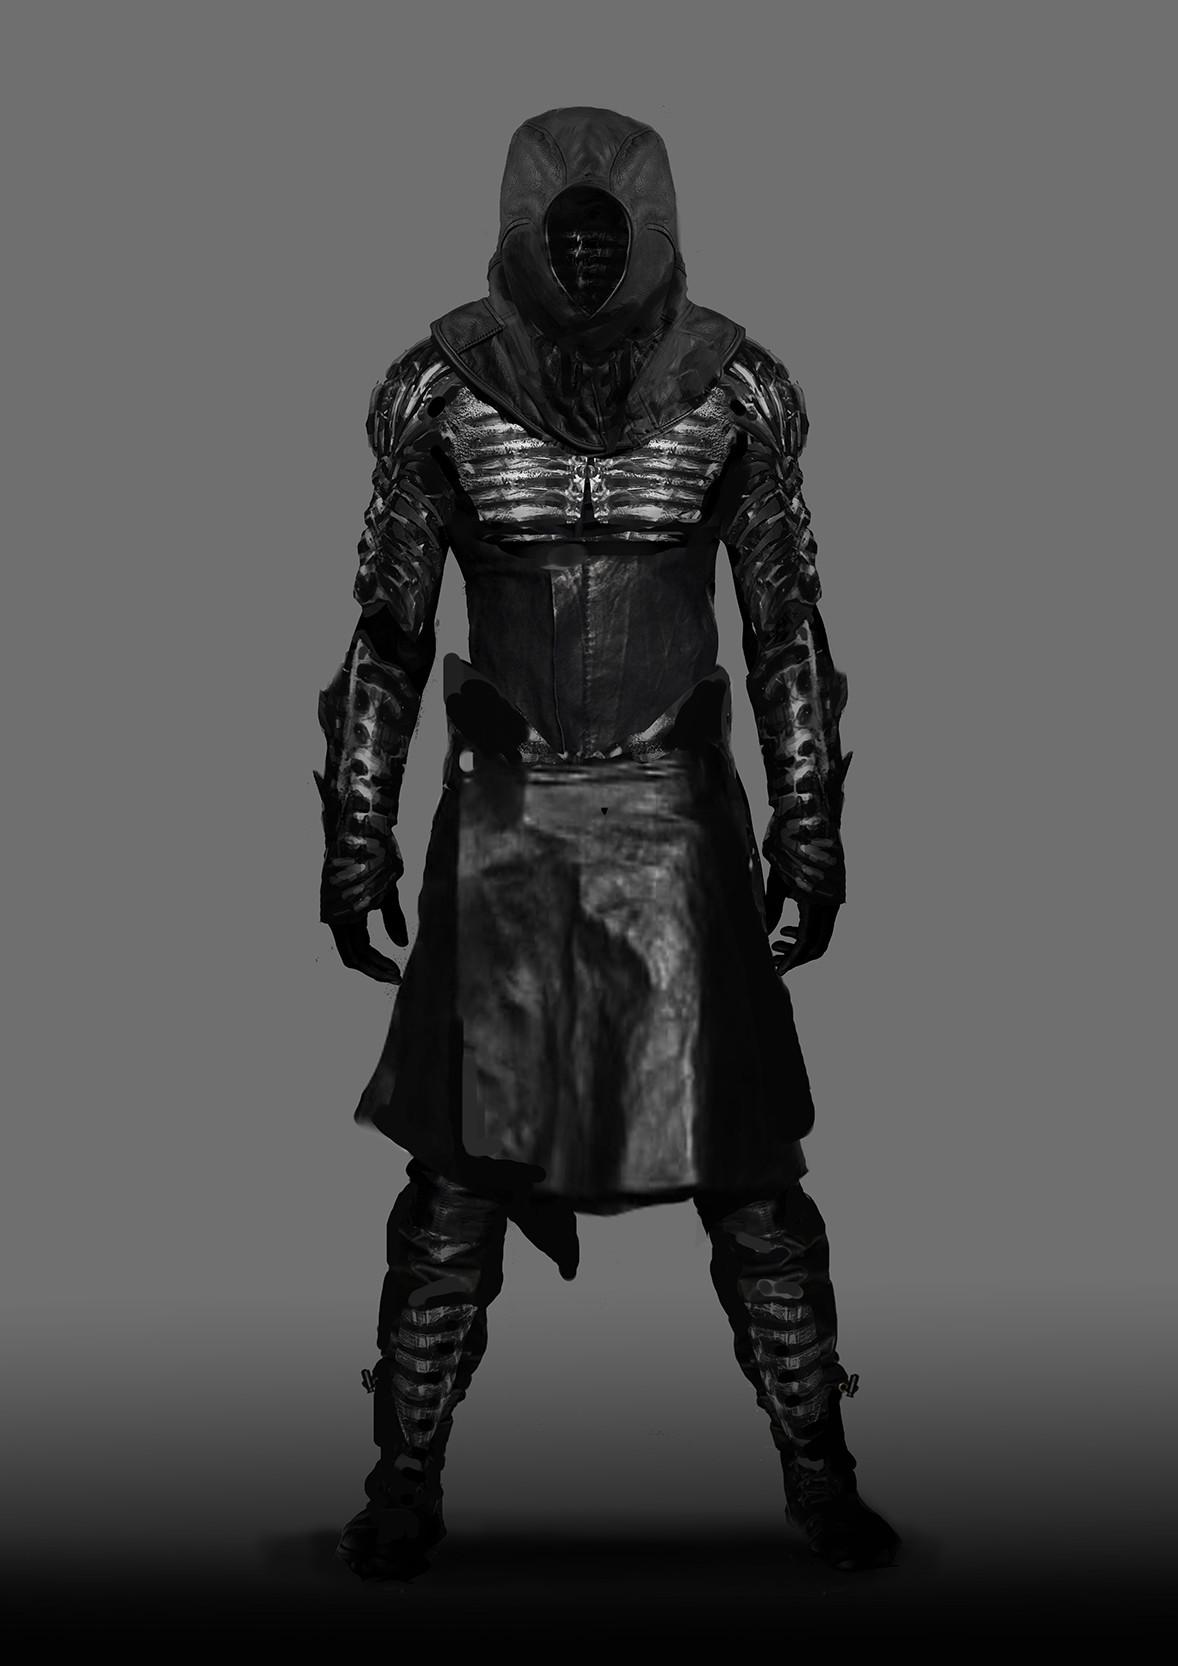 Andrei riabovitchev armor v036